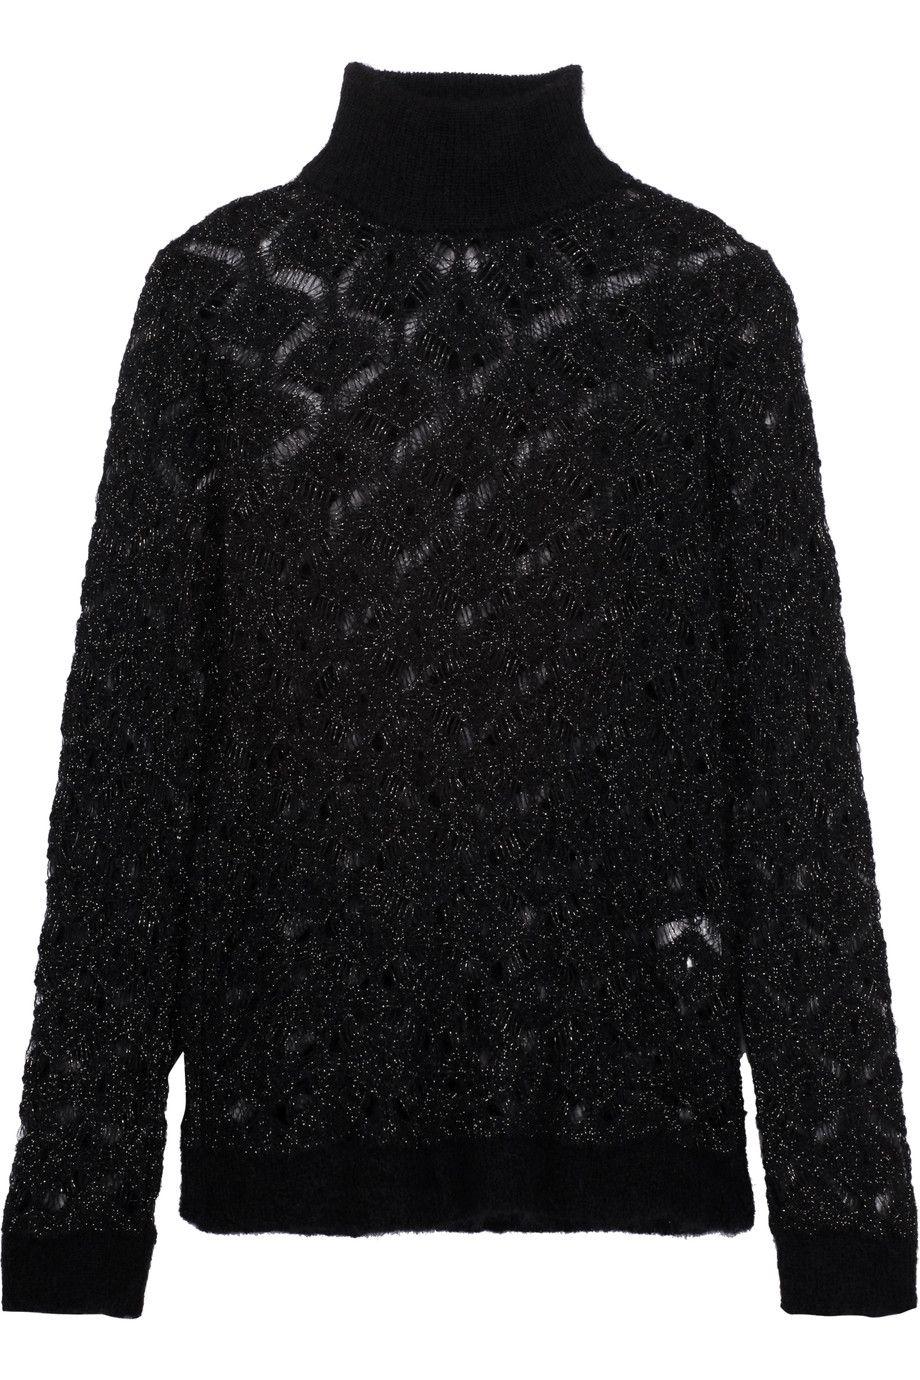 BALMAIN Metallic Open-Knit Mohair-Blend Turtleneck Sweater. #balmain #cloth  #